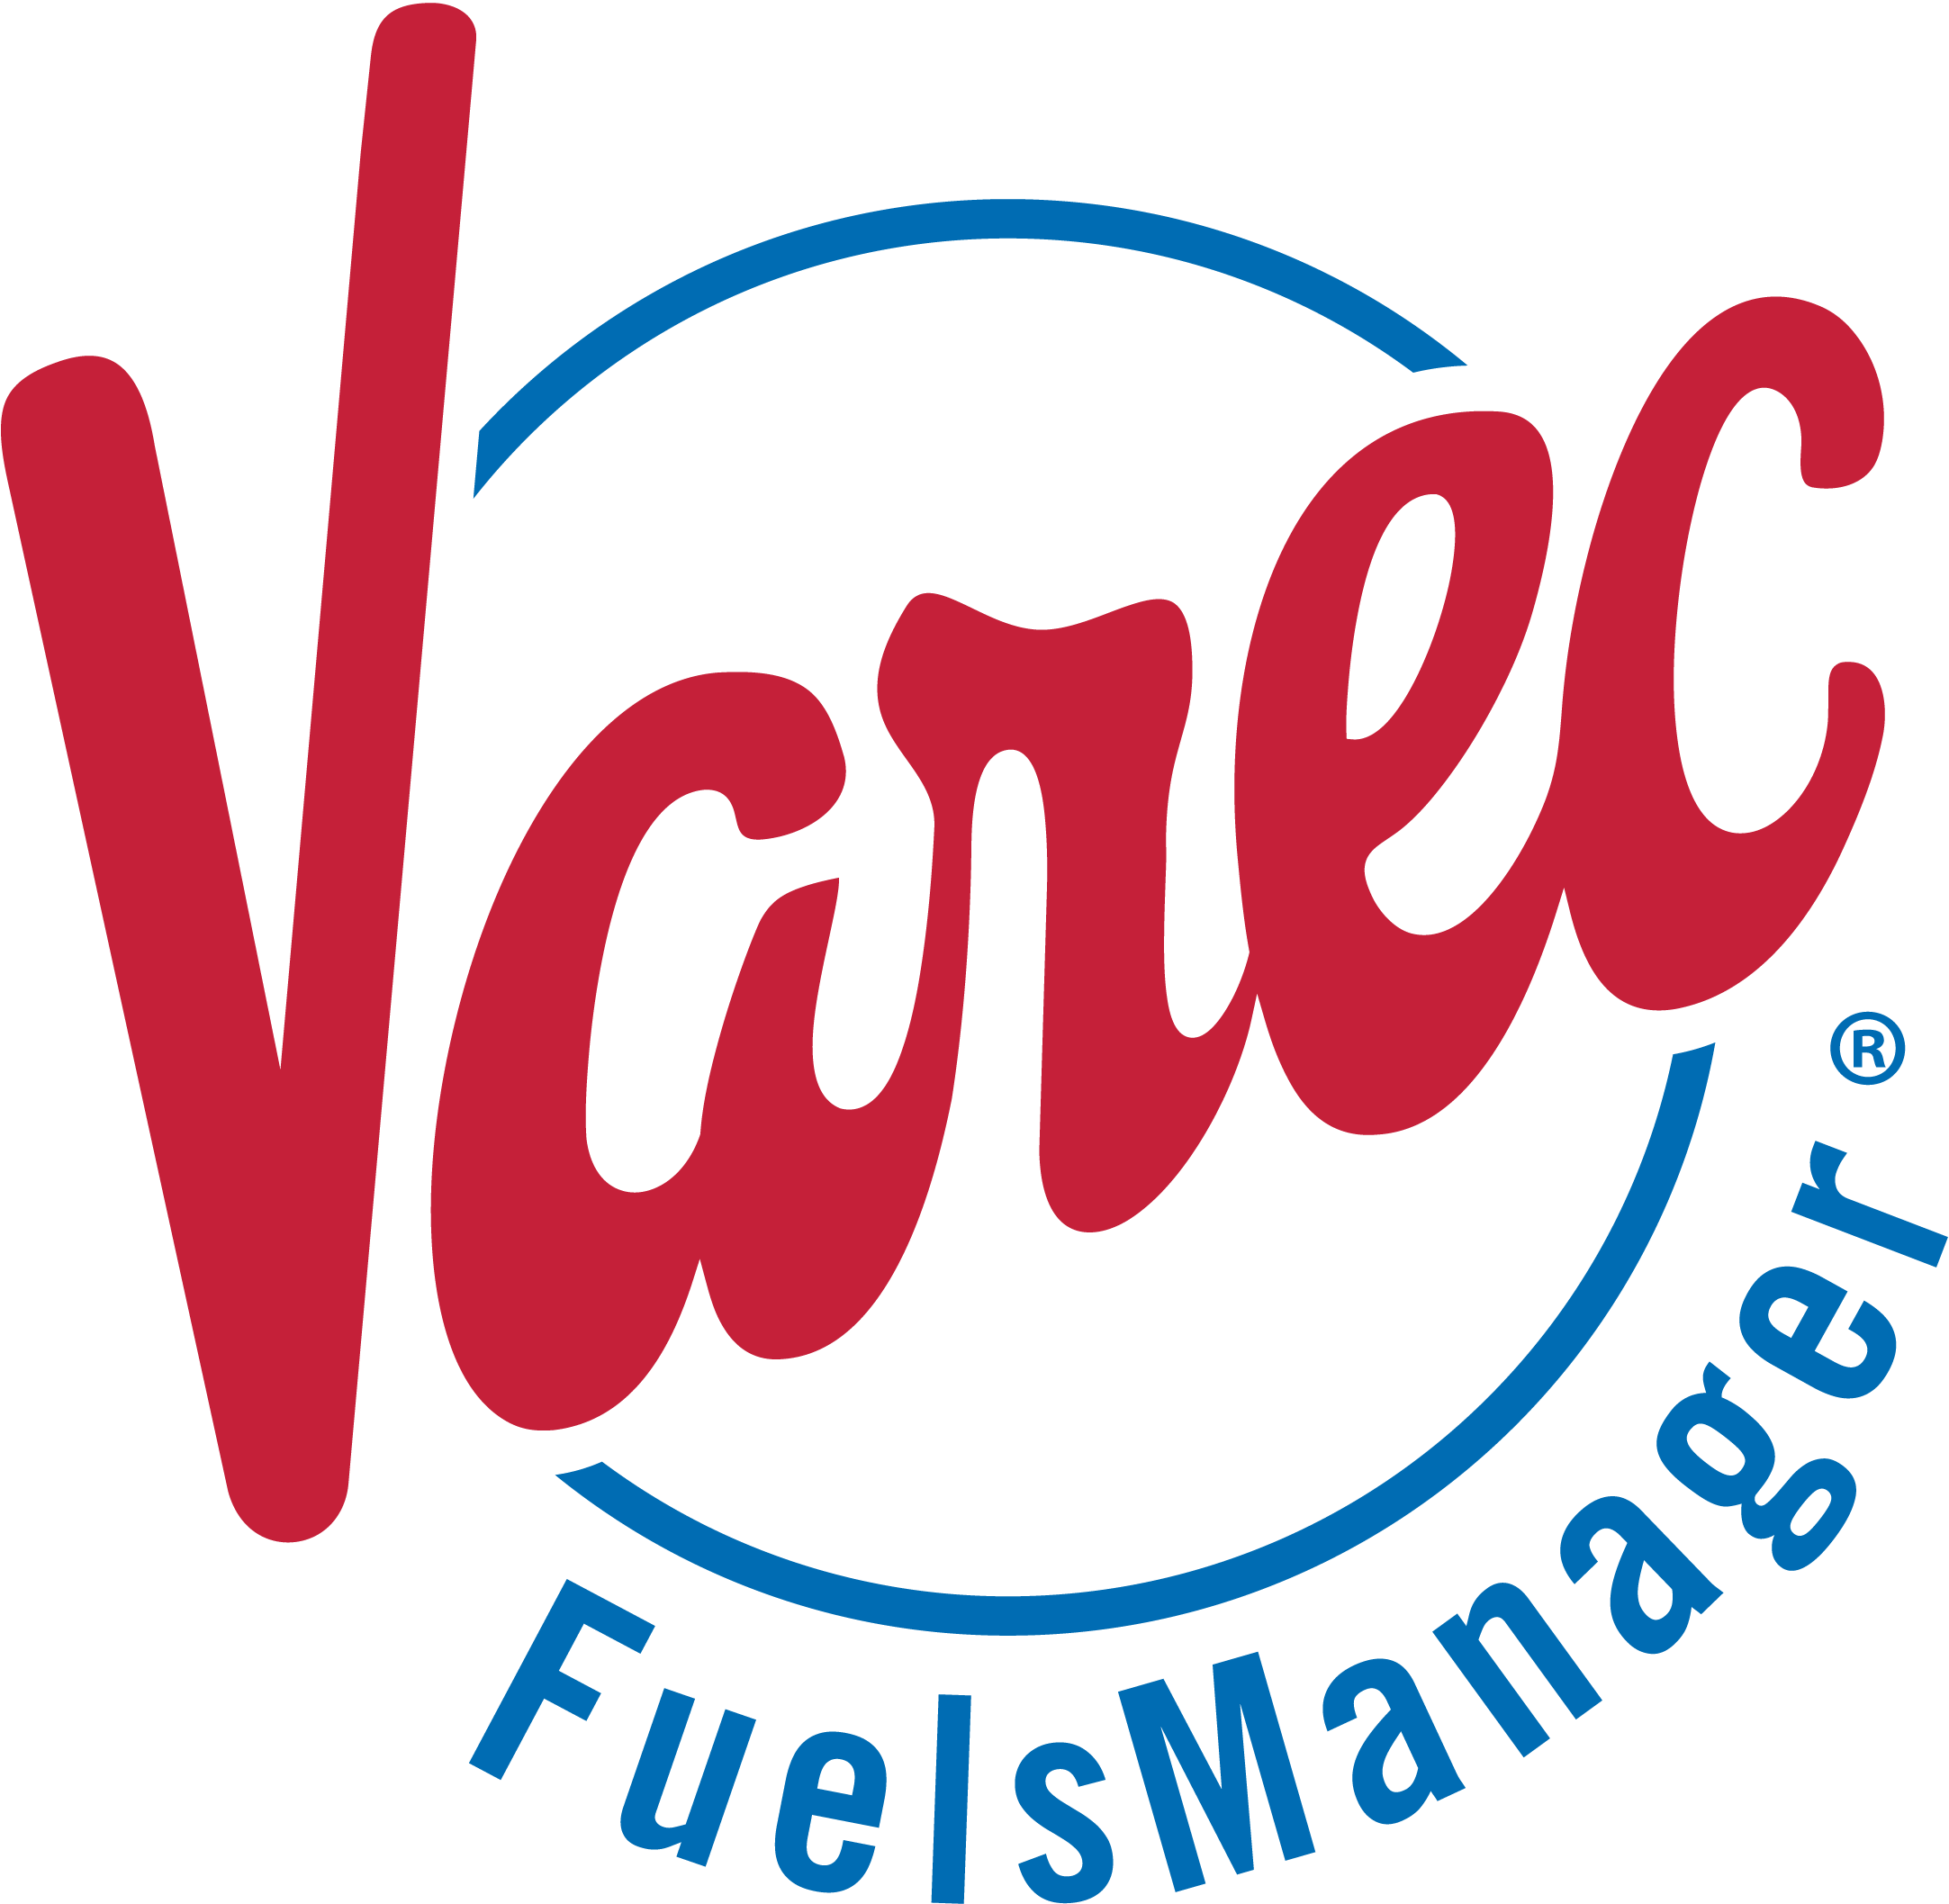 Varec FuelsManager Logo